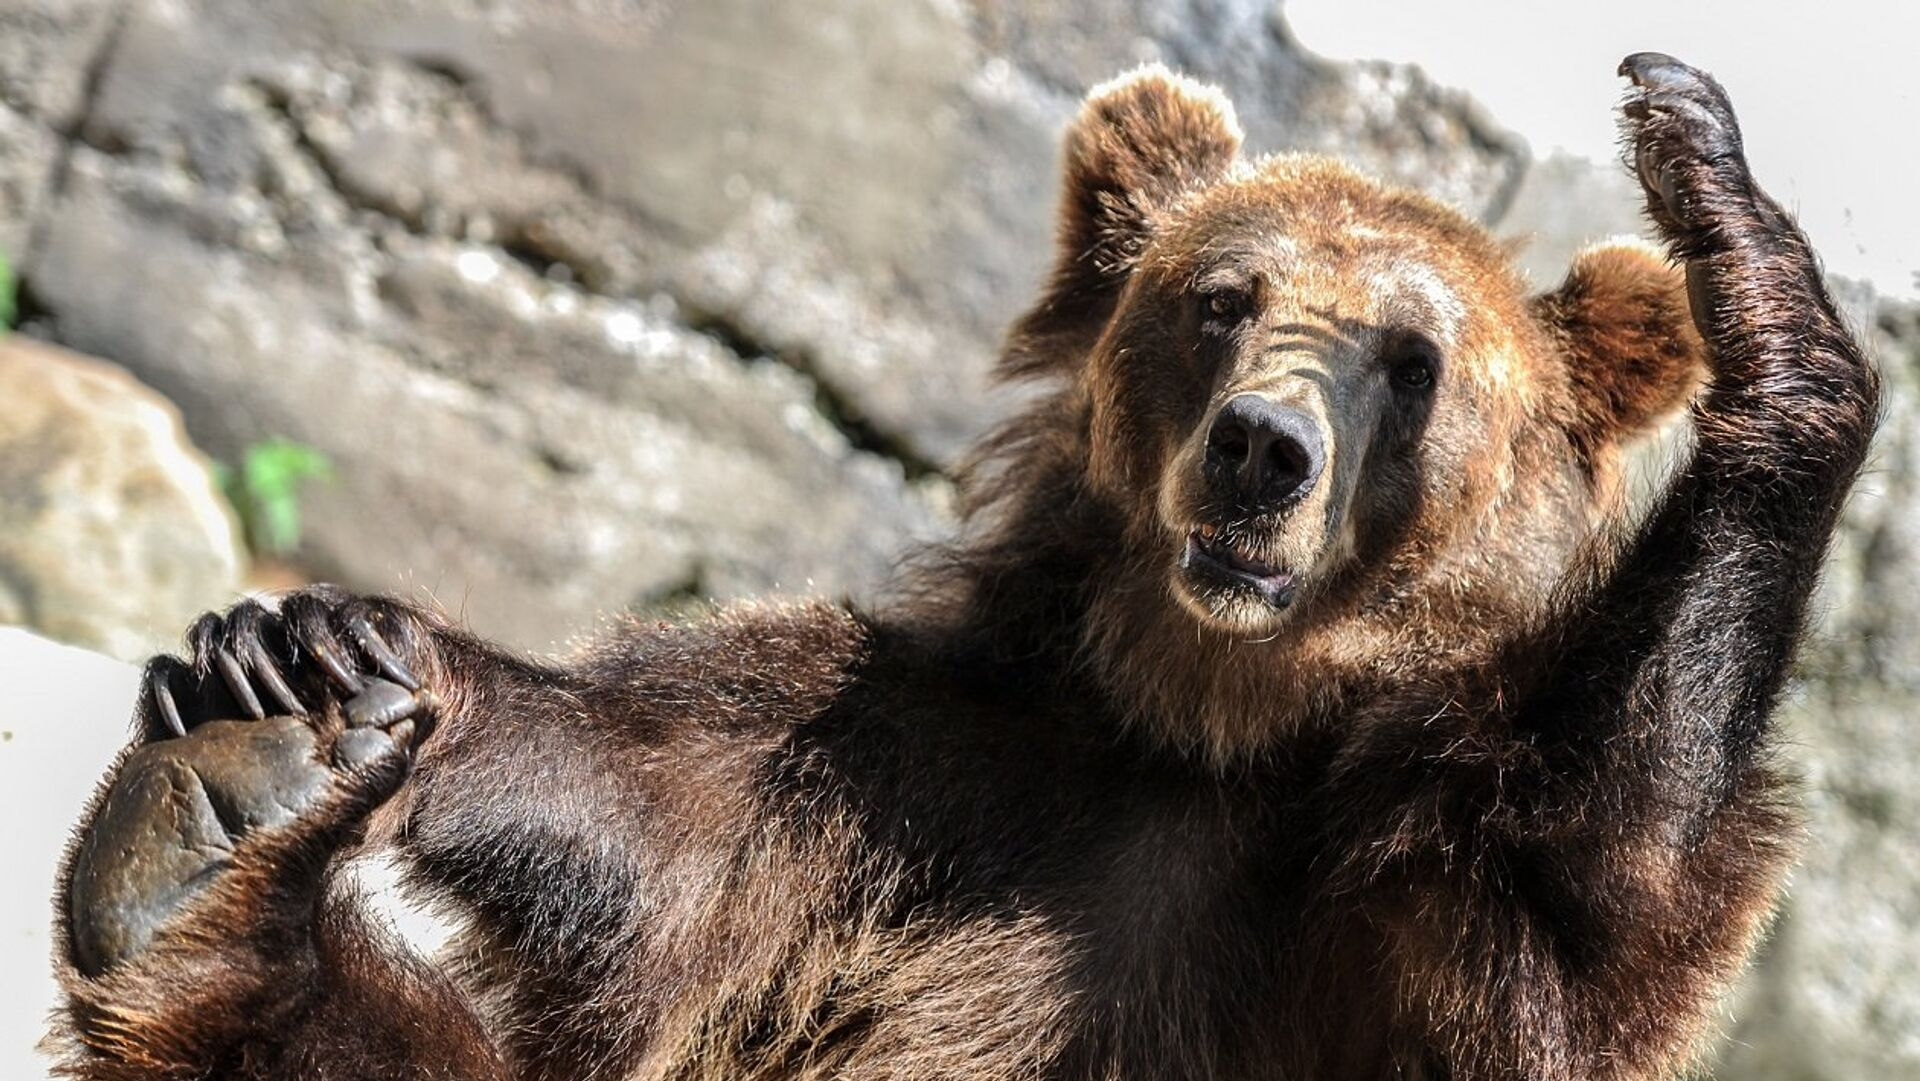 Бурый медведь, архивное фото - Sputnik Беларусь, 1920, 12.07.2021